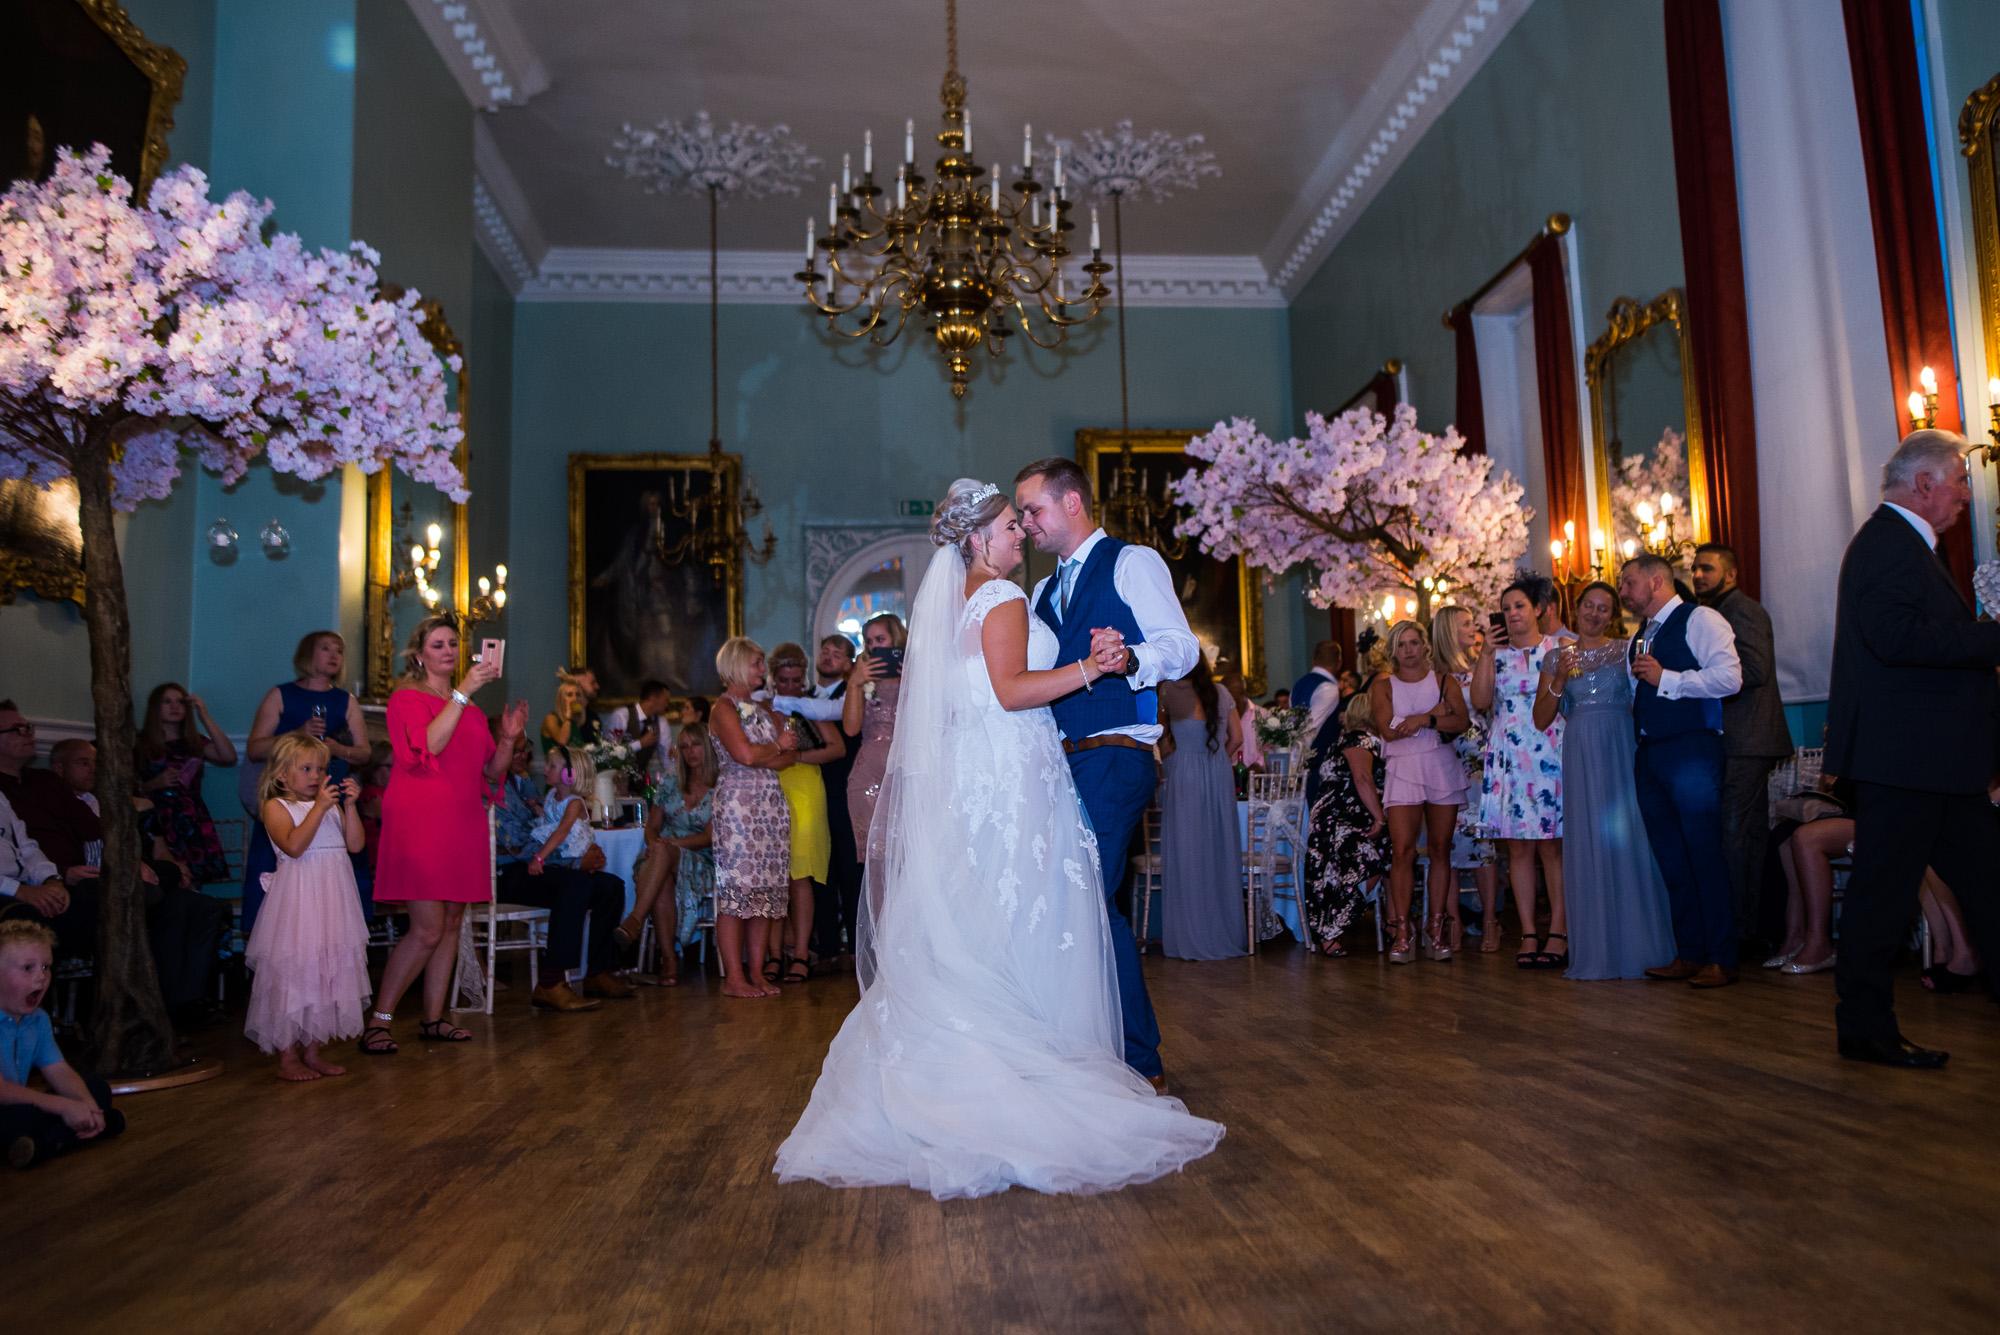 Savannah and Josh wedding photos (339 of 350).jpg